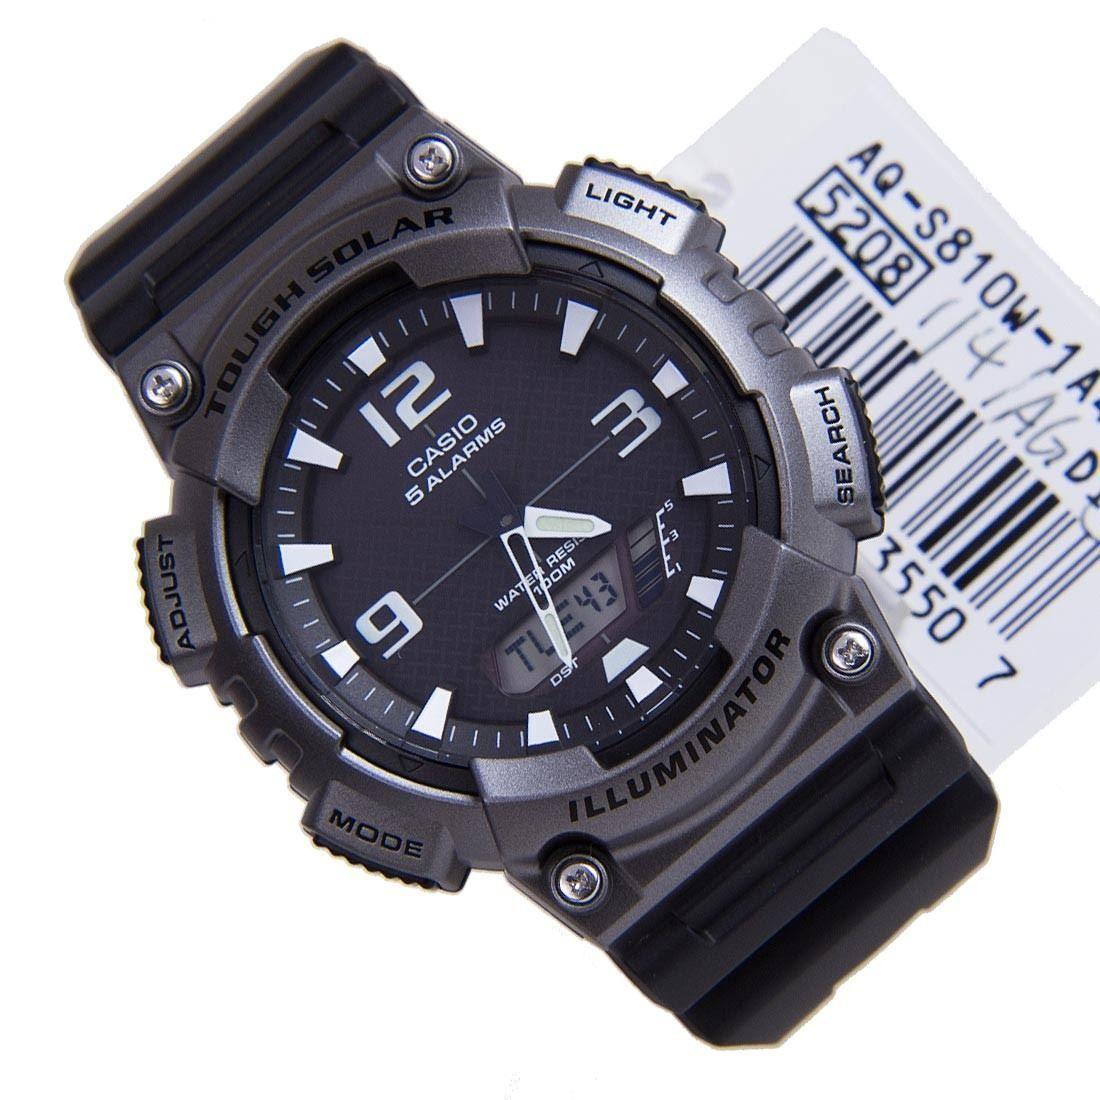 Harga Jual Lyst G Shock Sport Aqs810w 8av Black Rubber Quartz Watch Casio Analog And Digital Aq S810w 3av Jam Tangan Pria Strap Hijau 1a4 1a4vdf Alarm Gents Watches